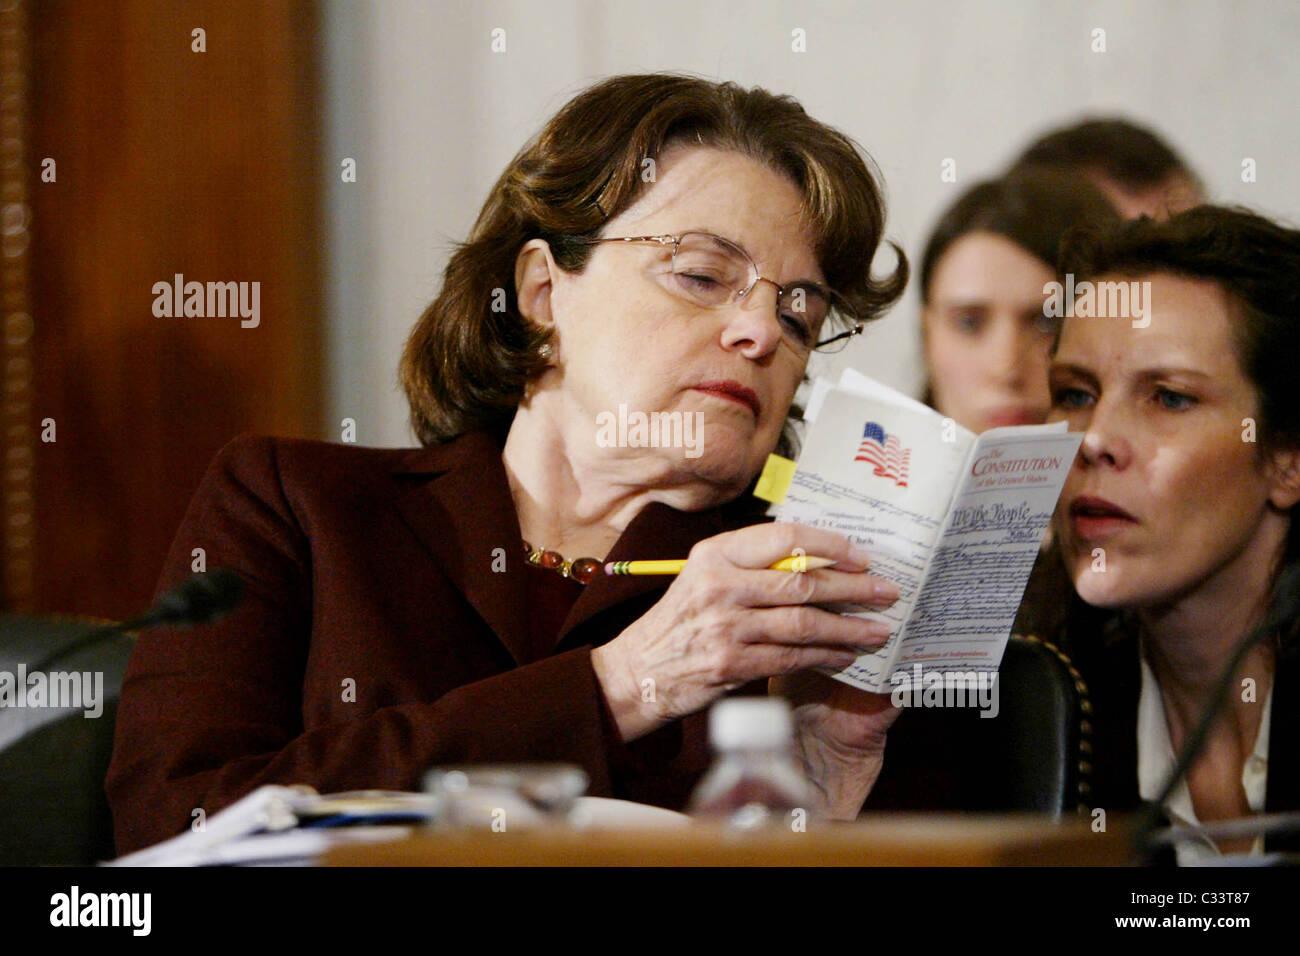 Senator Dianne Feinstein The Senate Judiciary Committee hearing for Eric Holder, President-Elect Obama's nominee - Stock Image